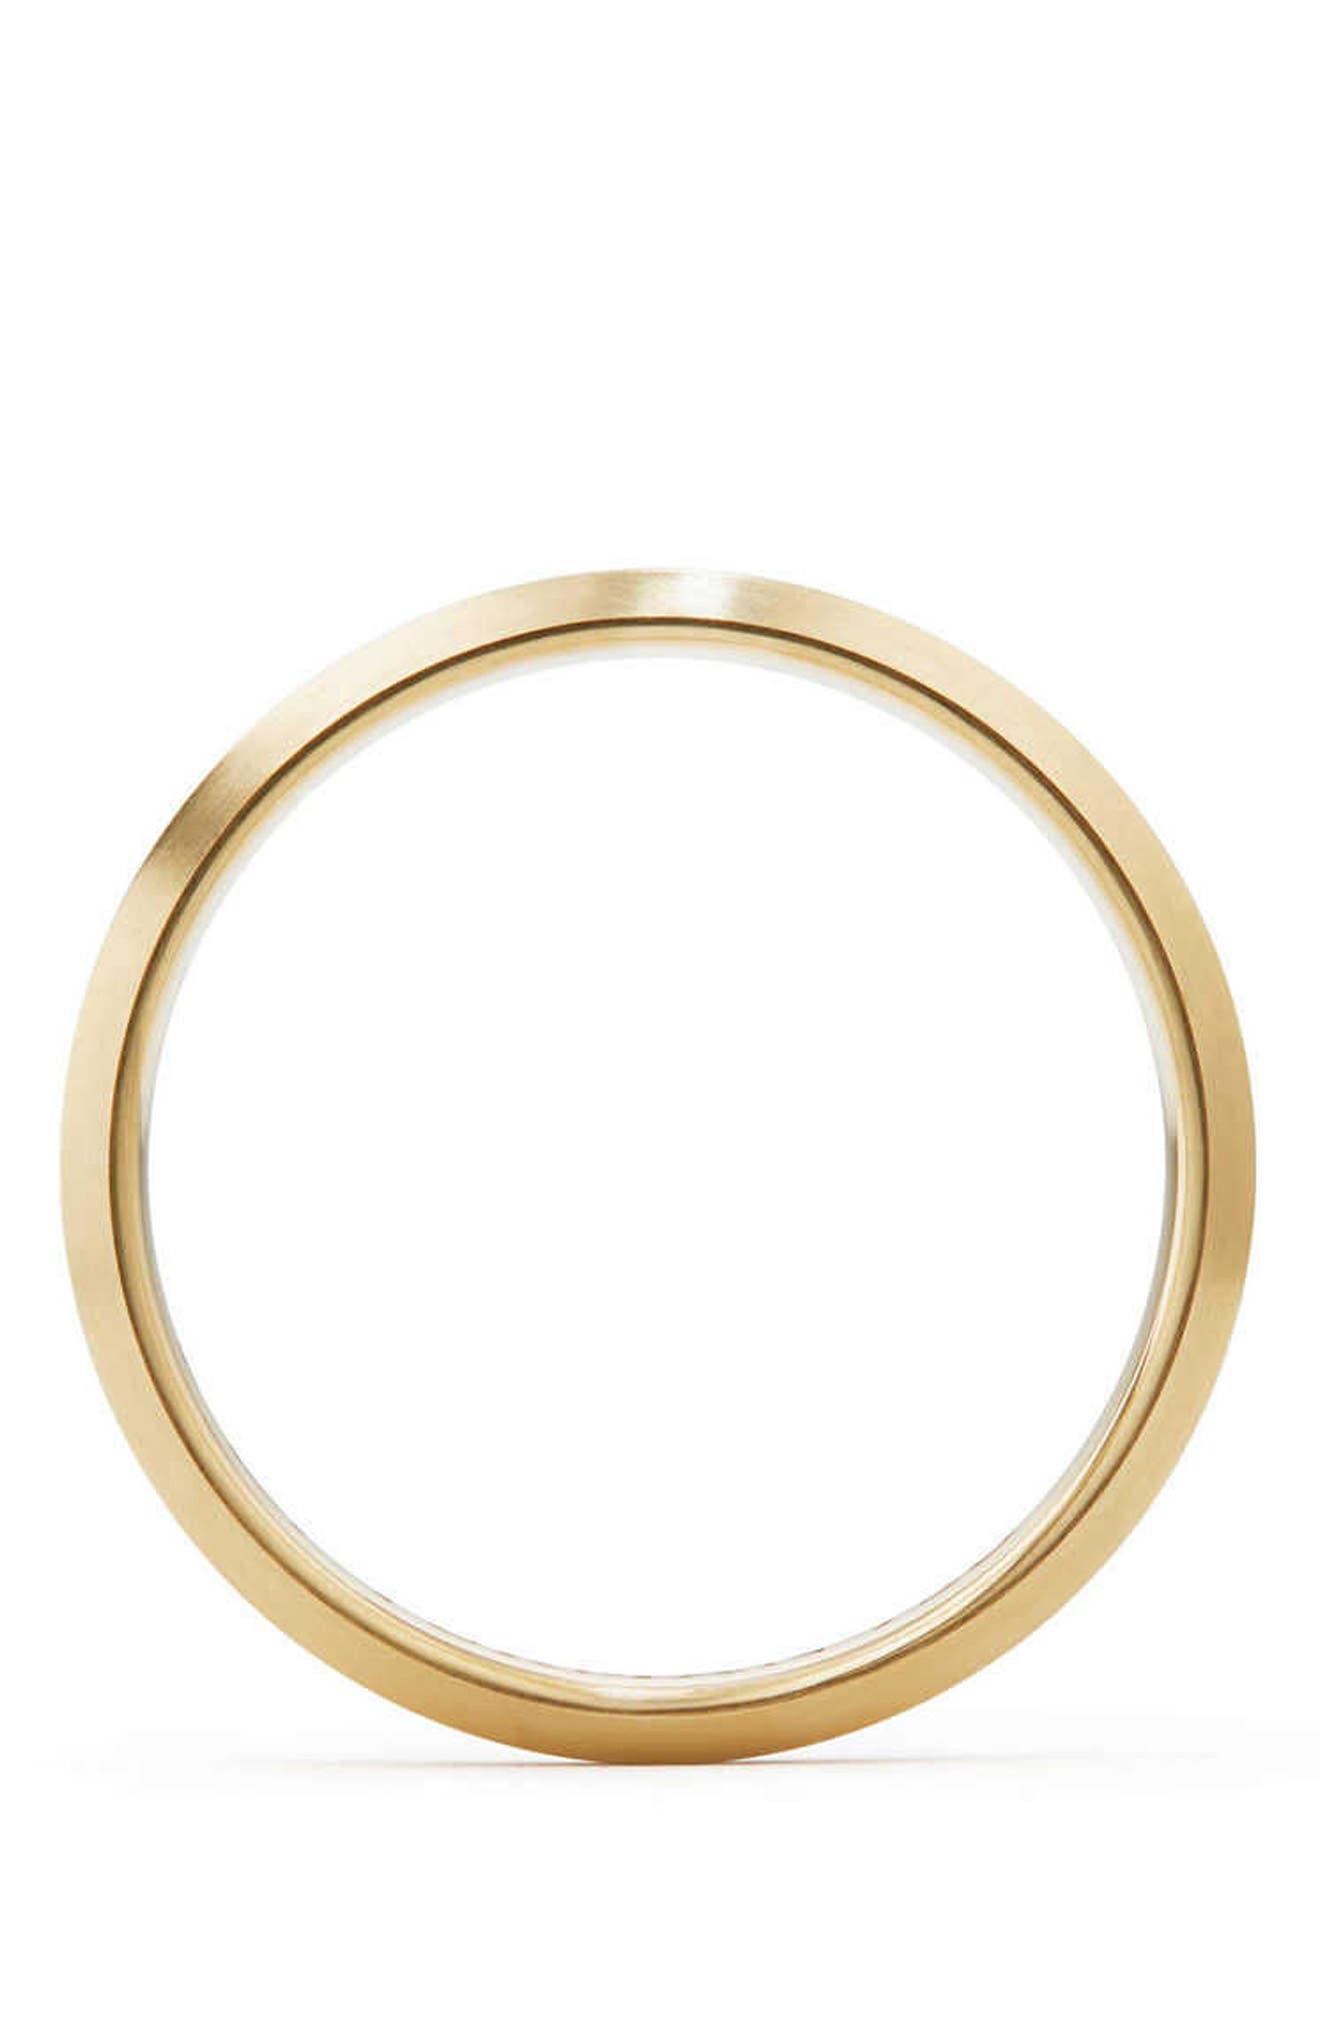 Streamline Band Ring in 18K Gold,                             Alternate thumbnail 2, color,                             Gold